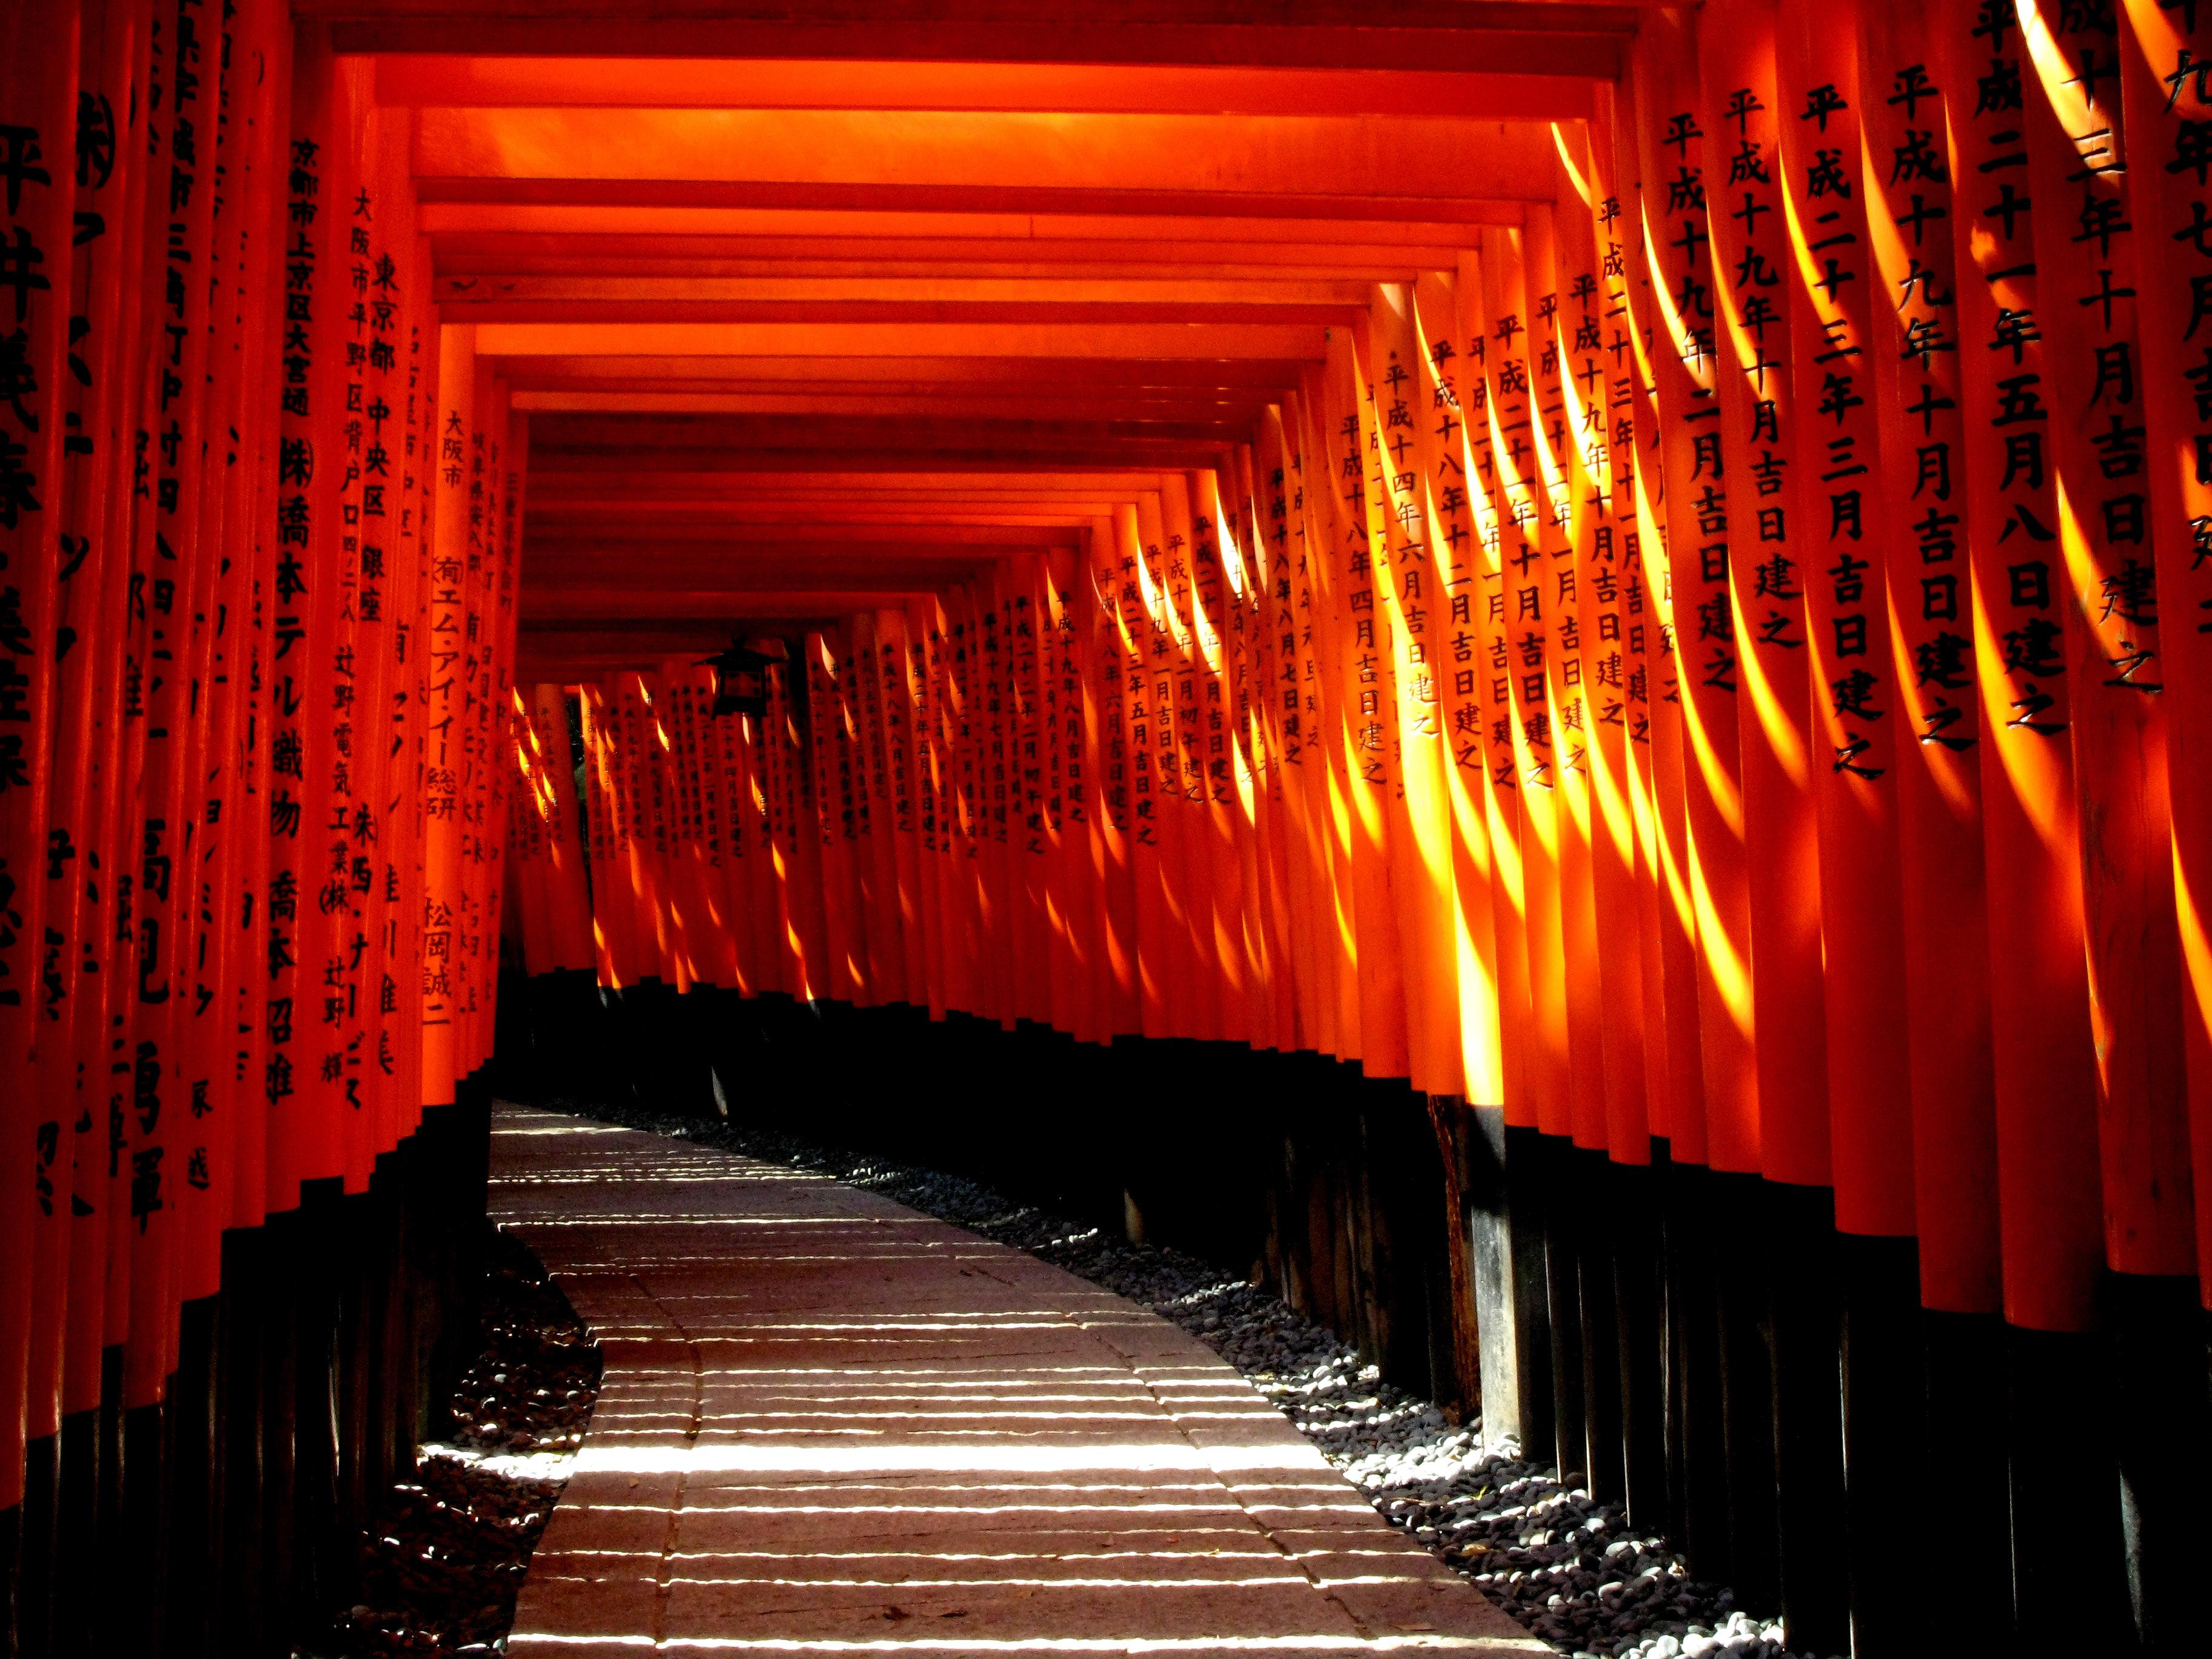 FileFushimi Inari taisha sembon toriijpg   Wikimedia Commons 3648x2736